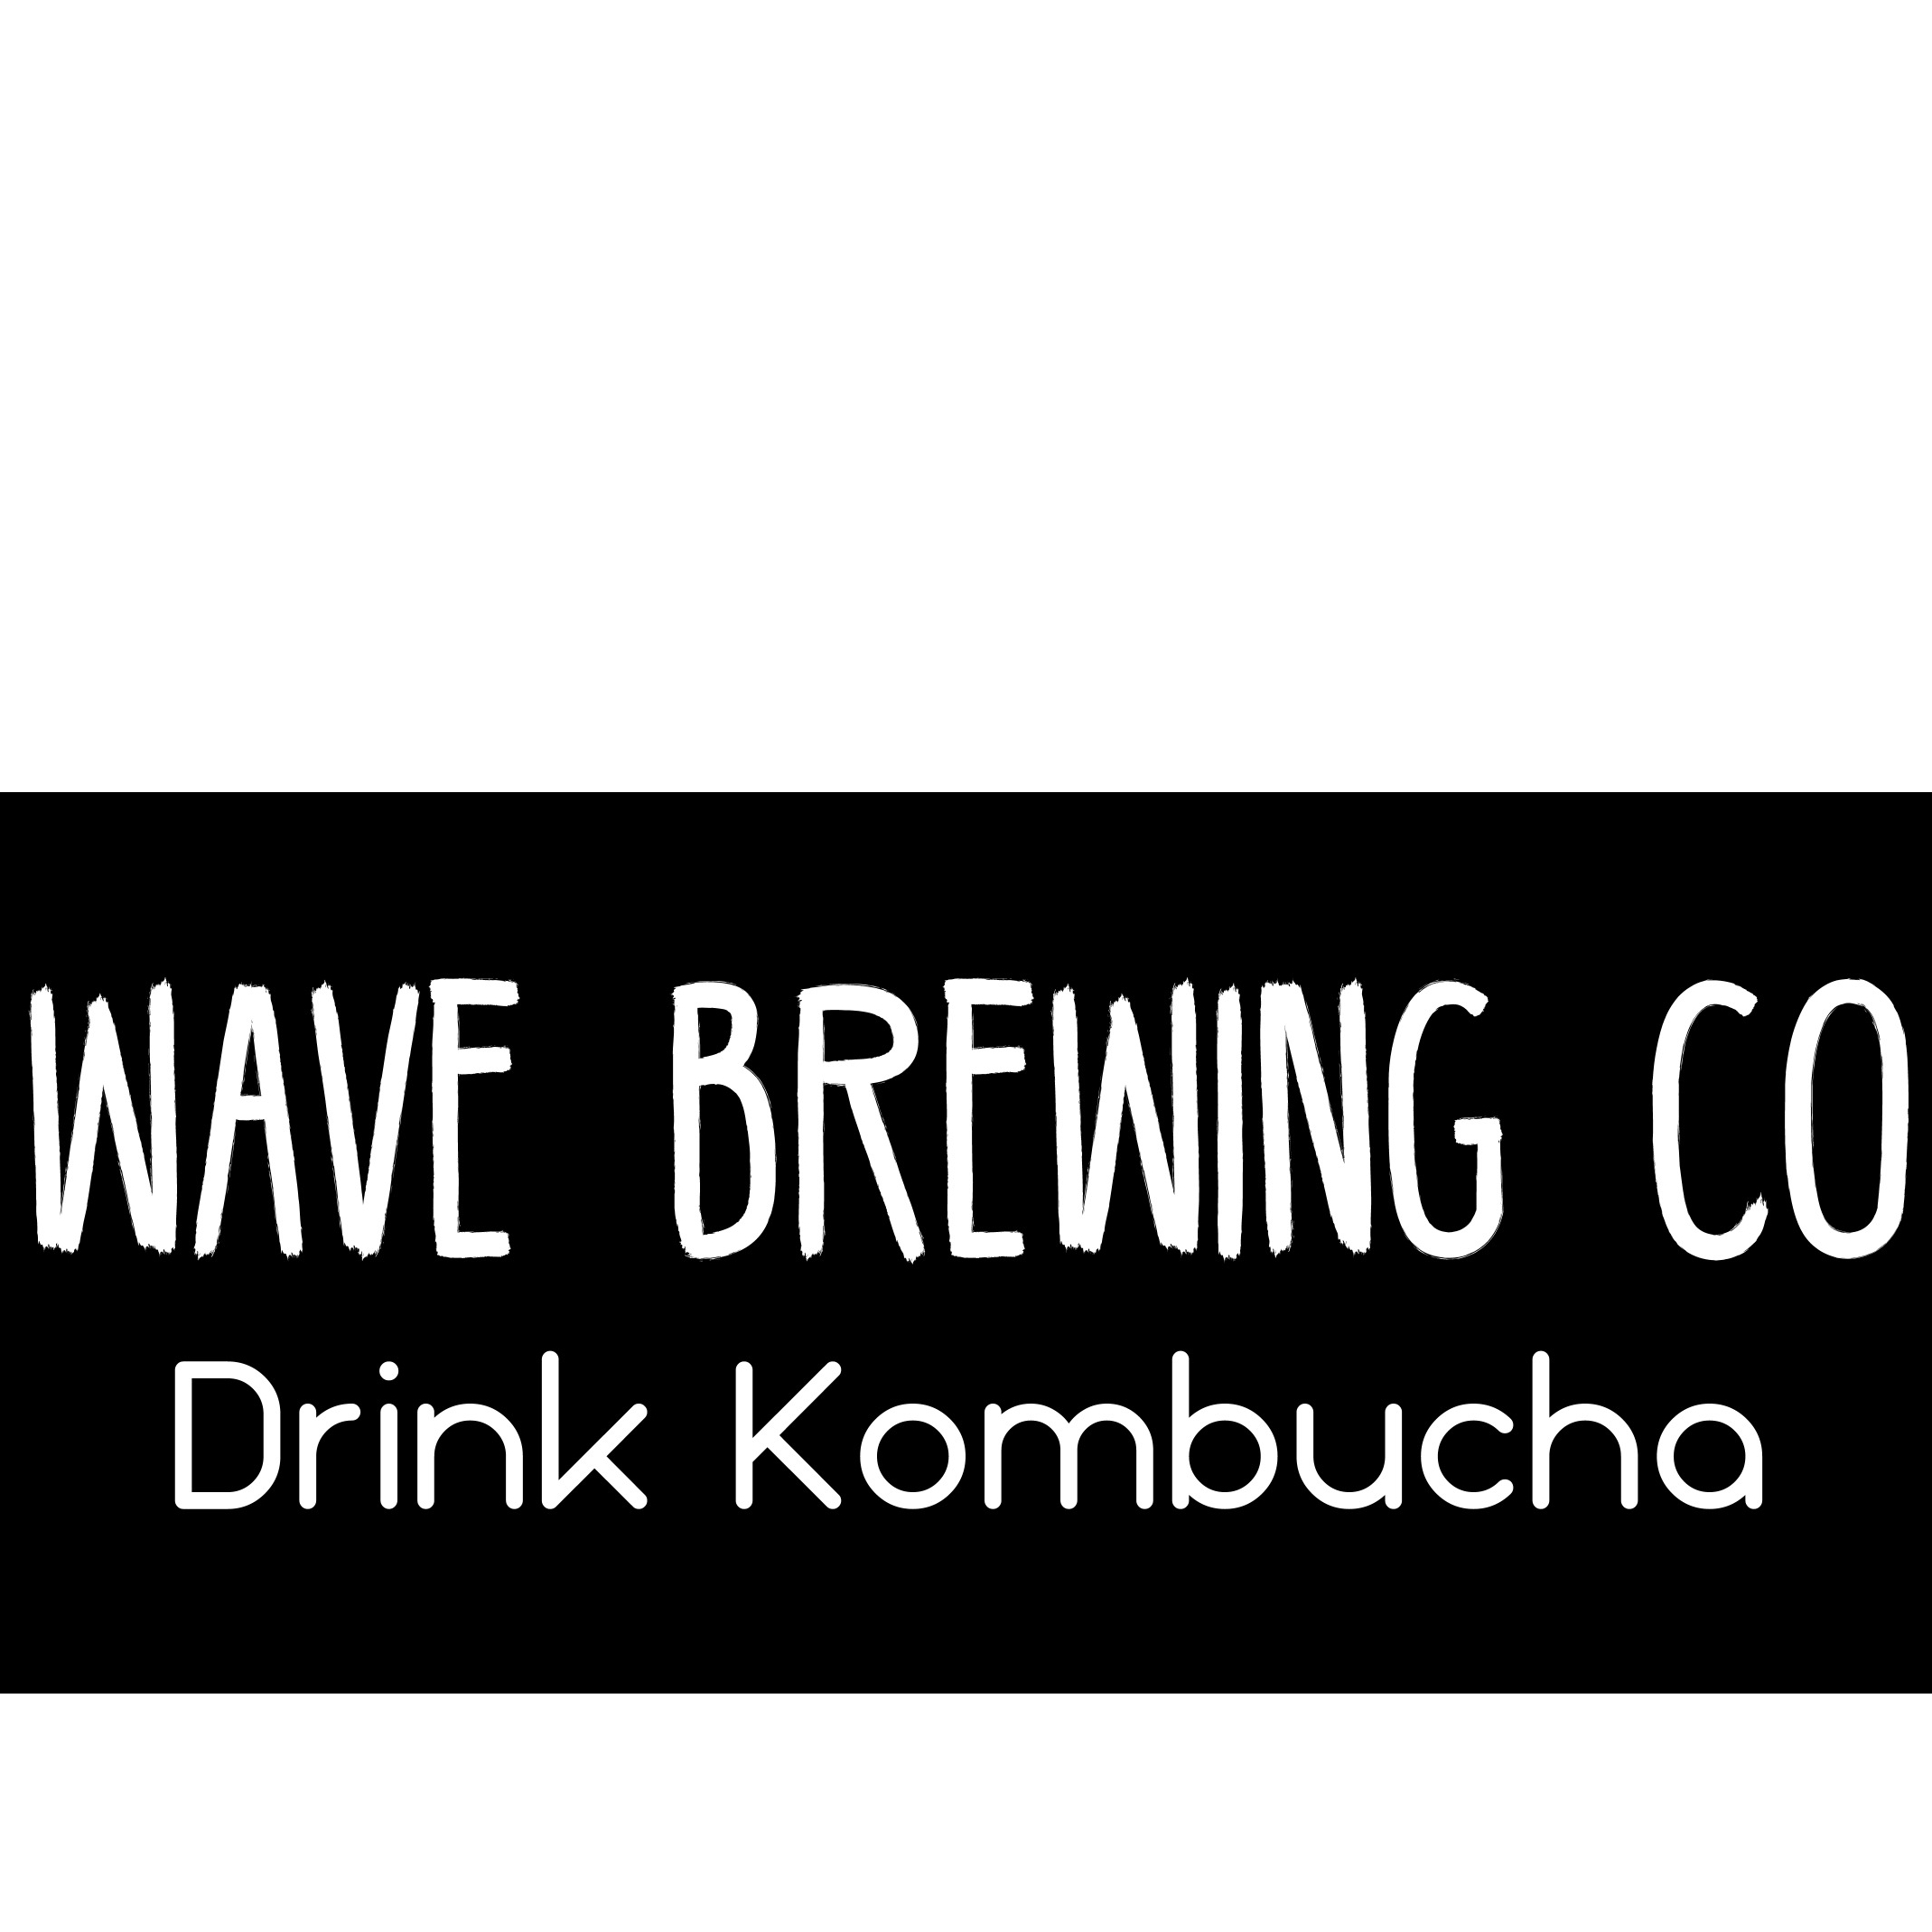 DRINK KOMBUCHA by Wave Brewing Company